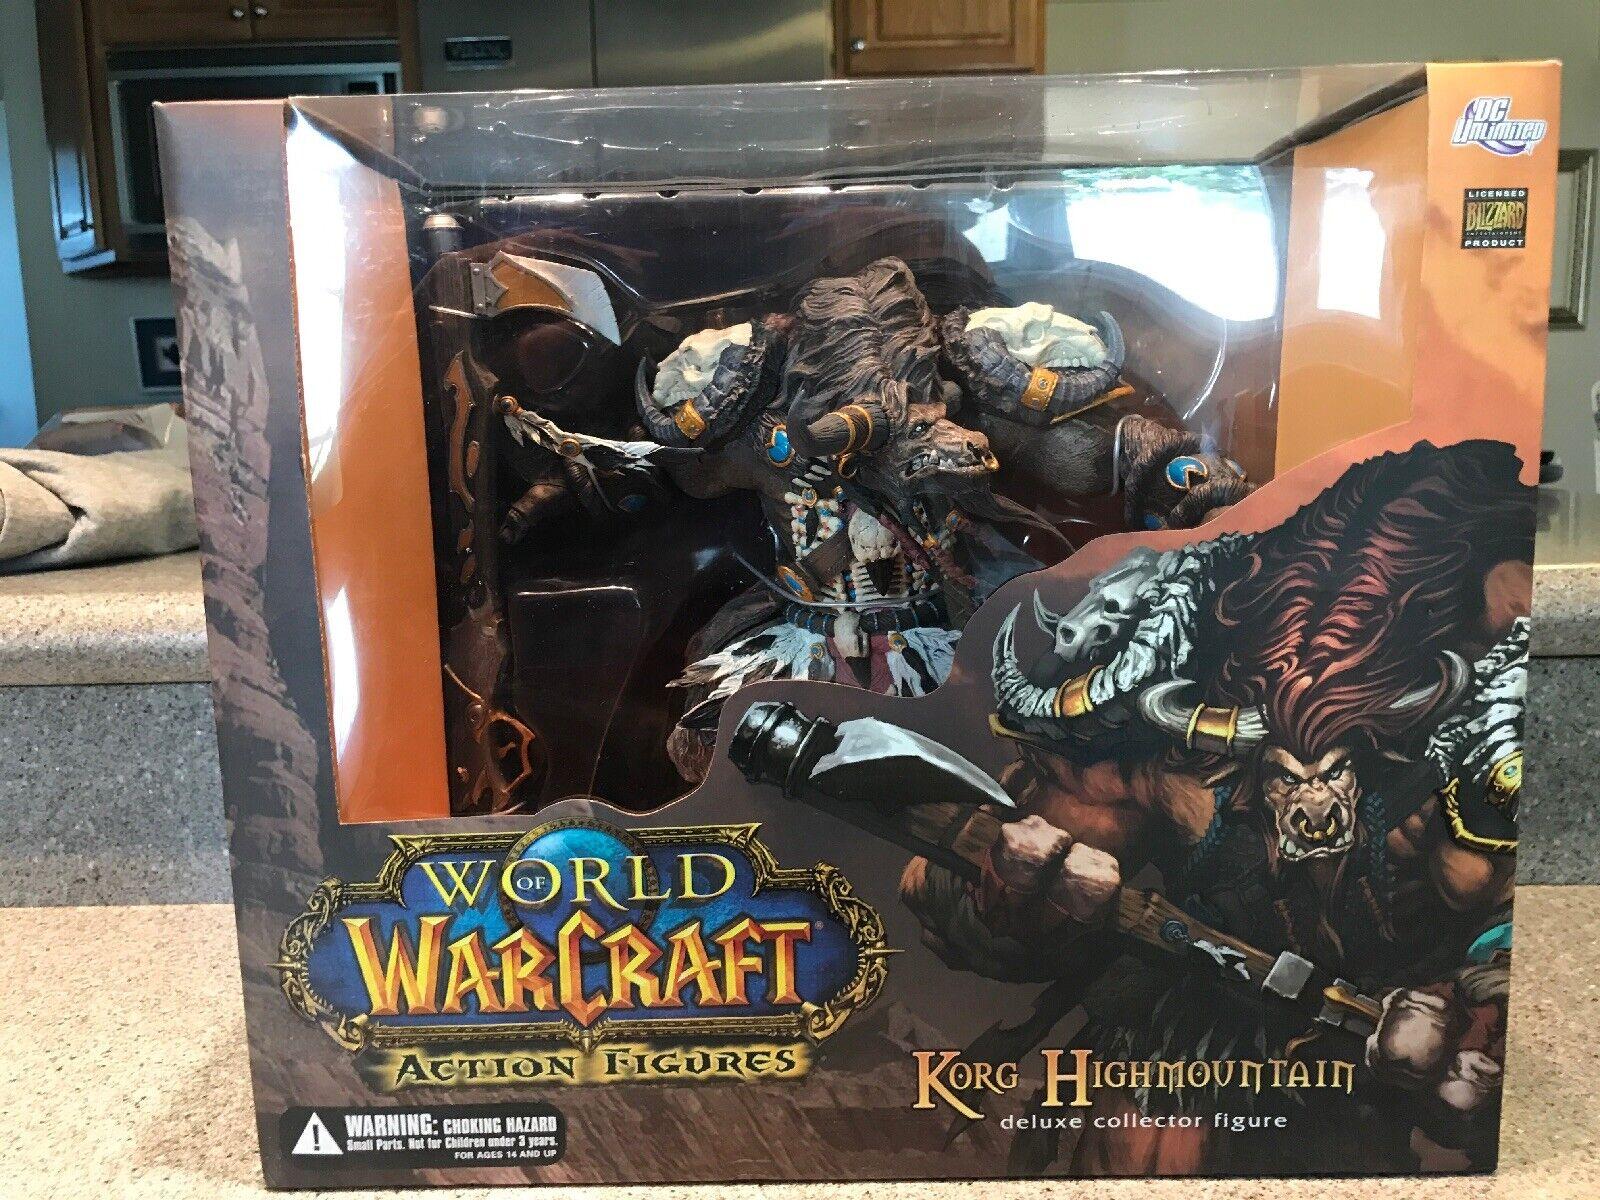 World of warcraft Action Figure Deluxe Collectors Figure - Korg Highmountain